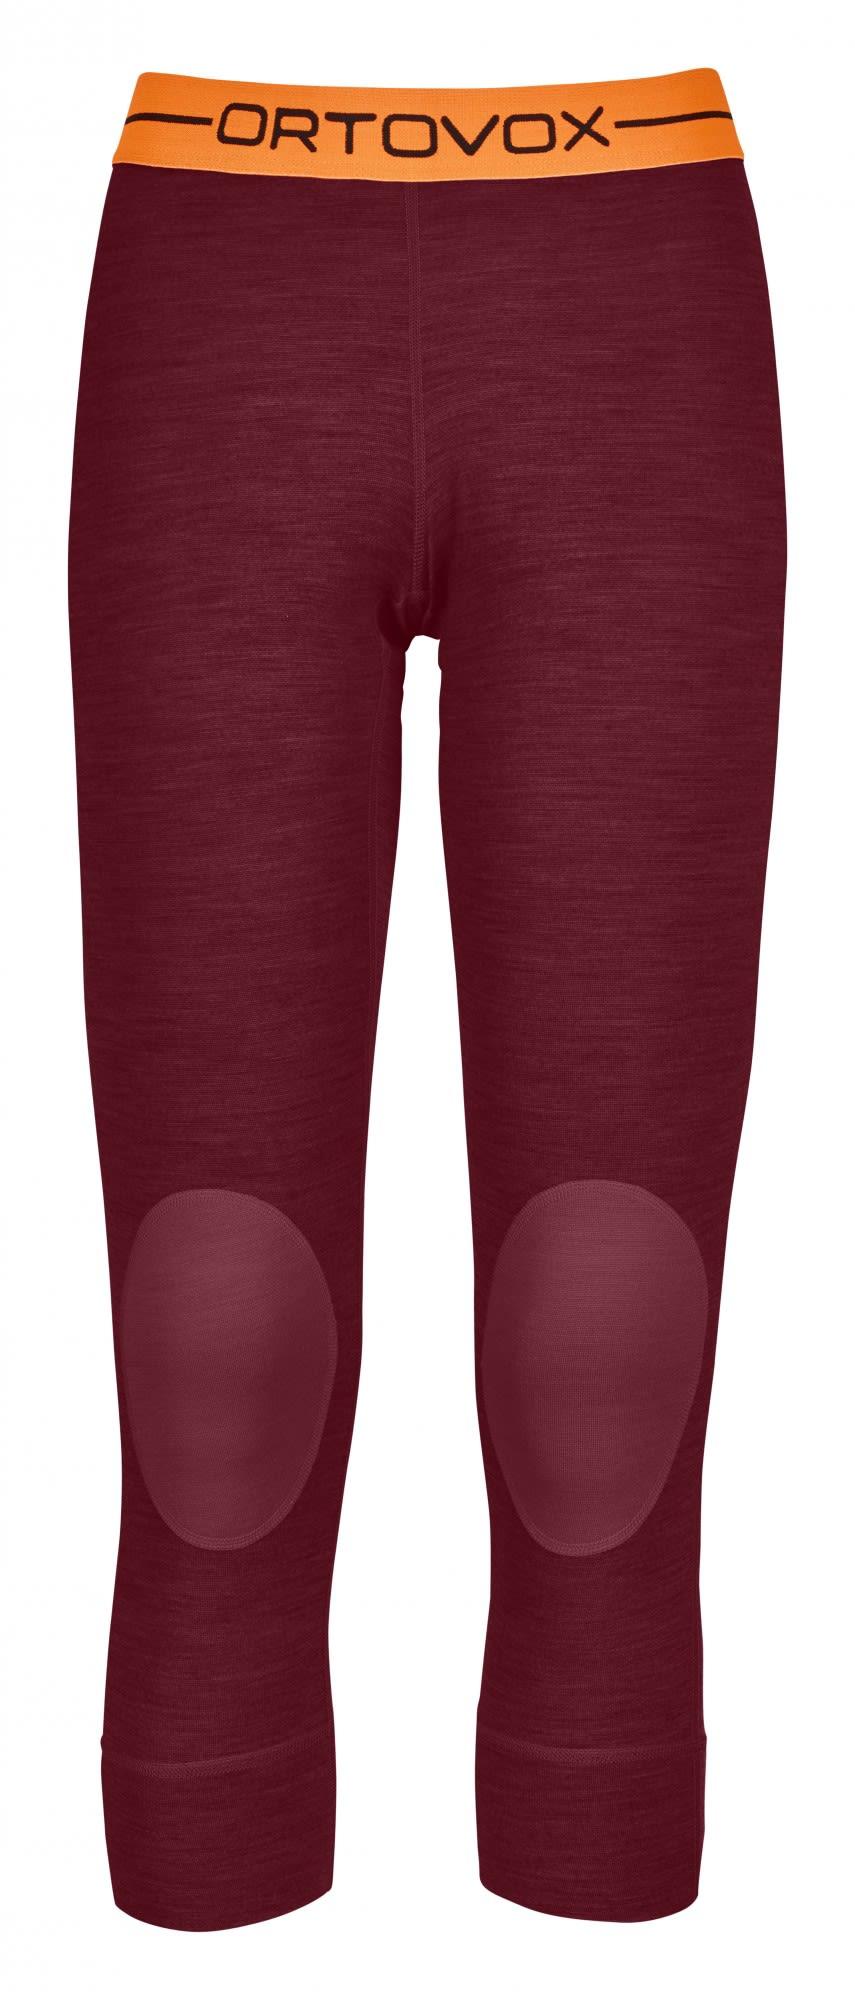 Ortovox 185 Merino Rock'n'wool Short Pants Rot, Female Merino Unterwäsche, S